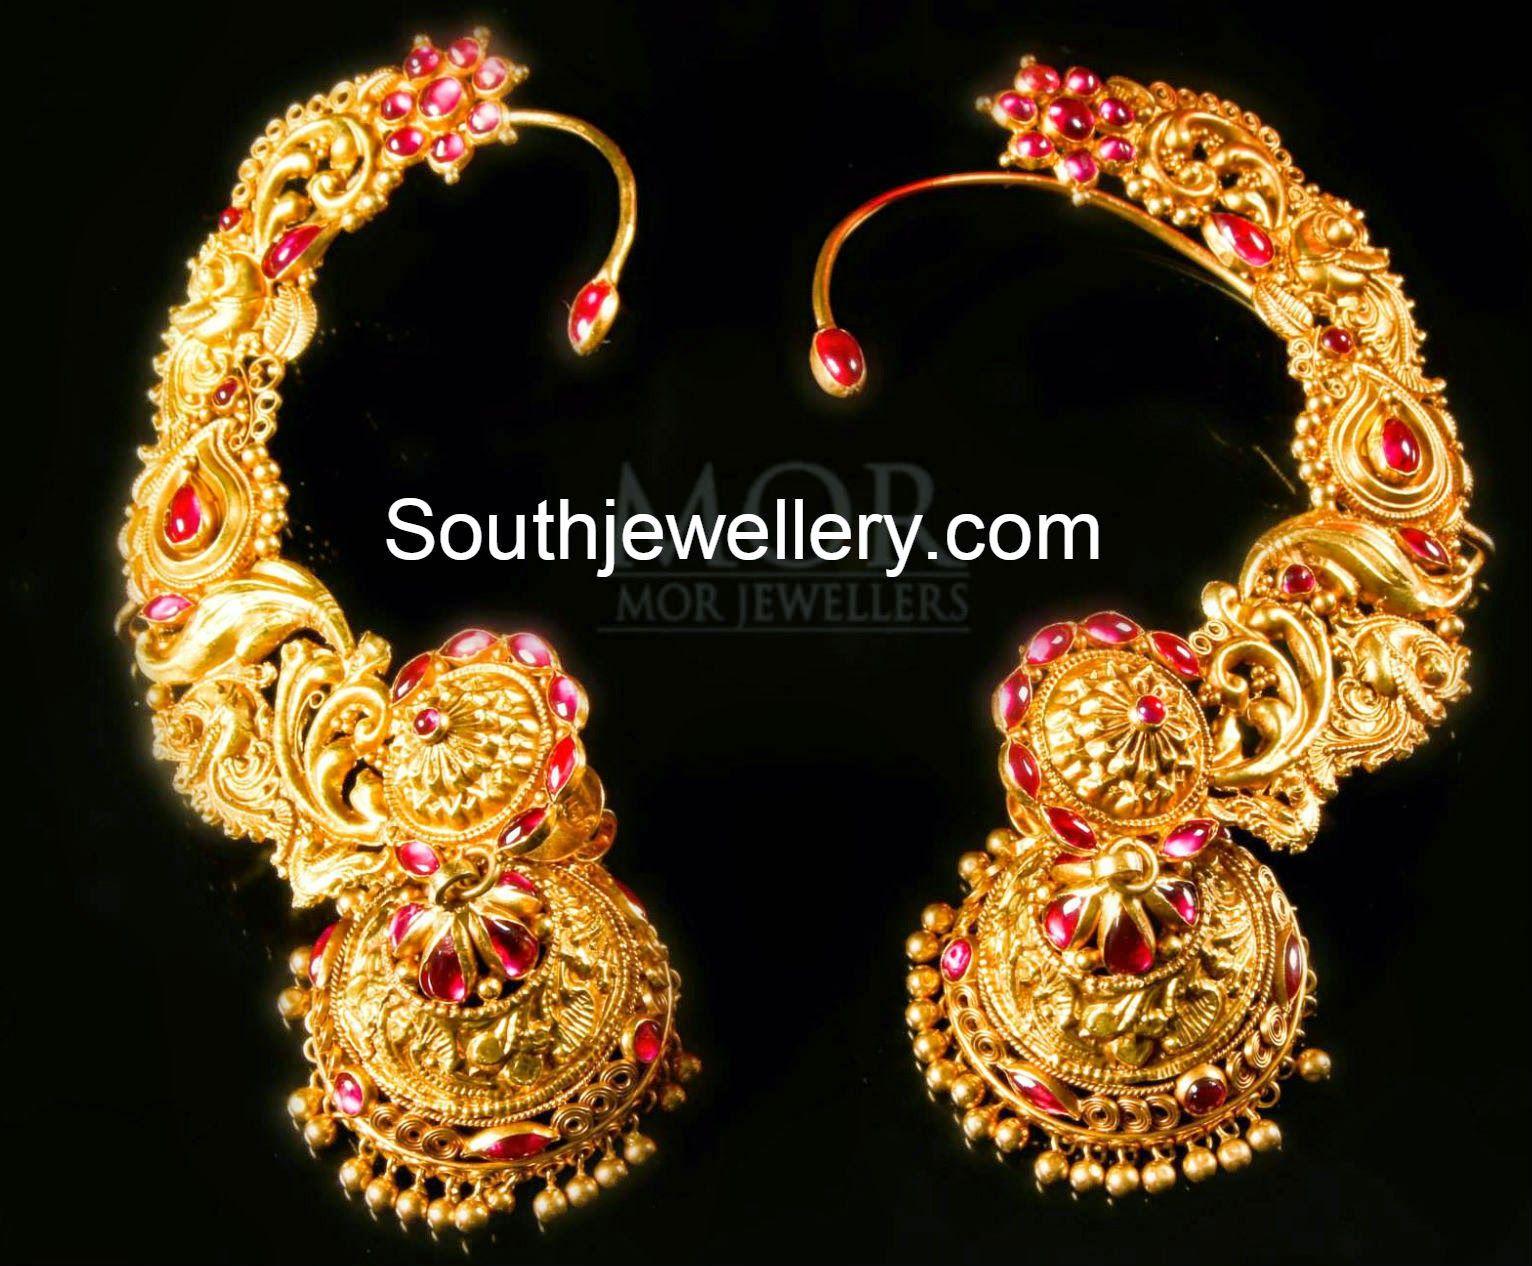 temple jhumkas full ear 1532—1266 gold